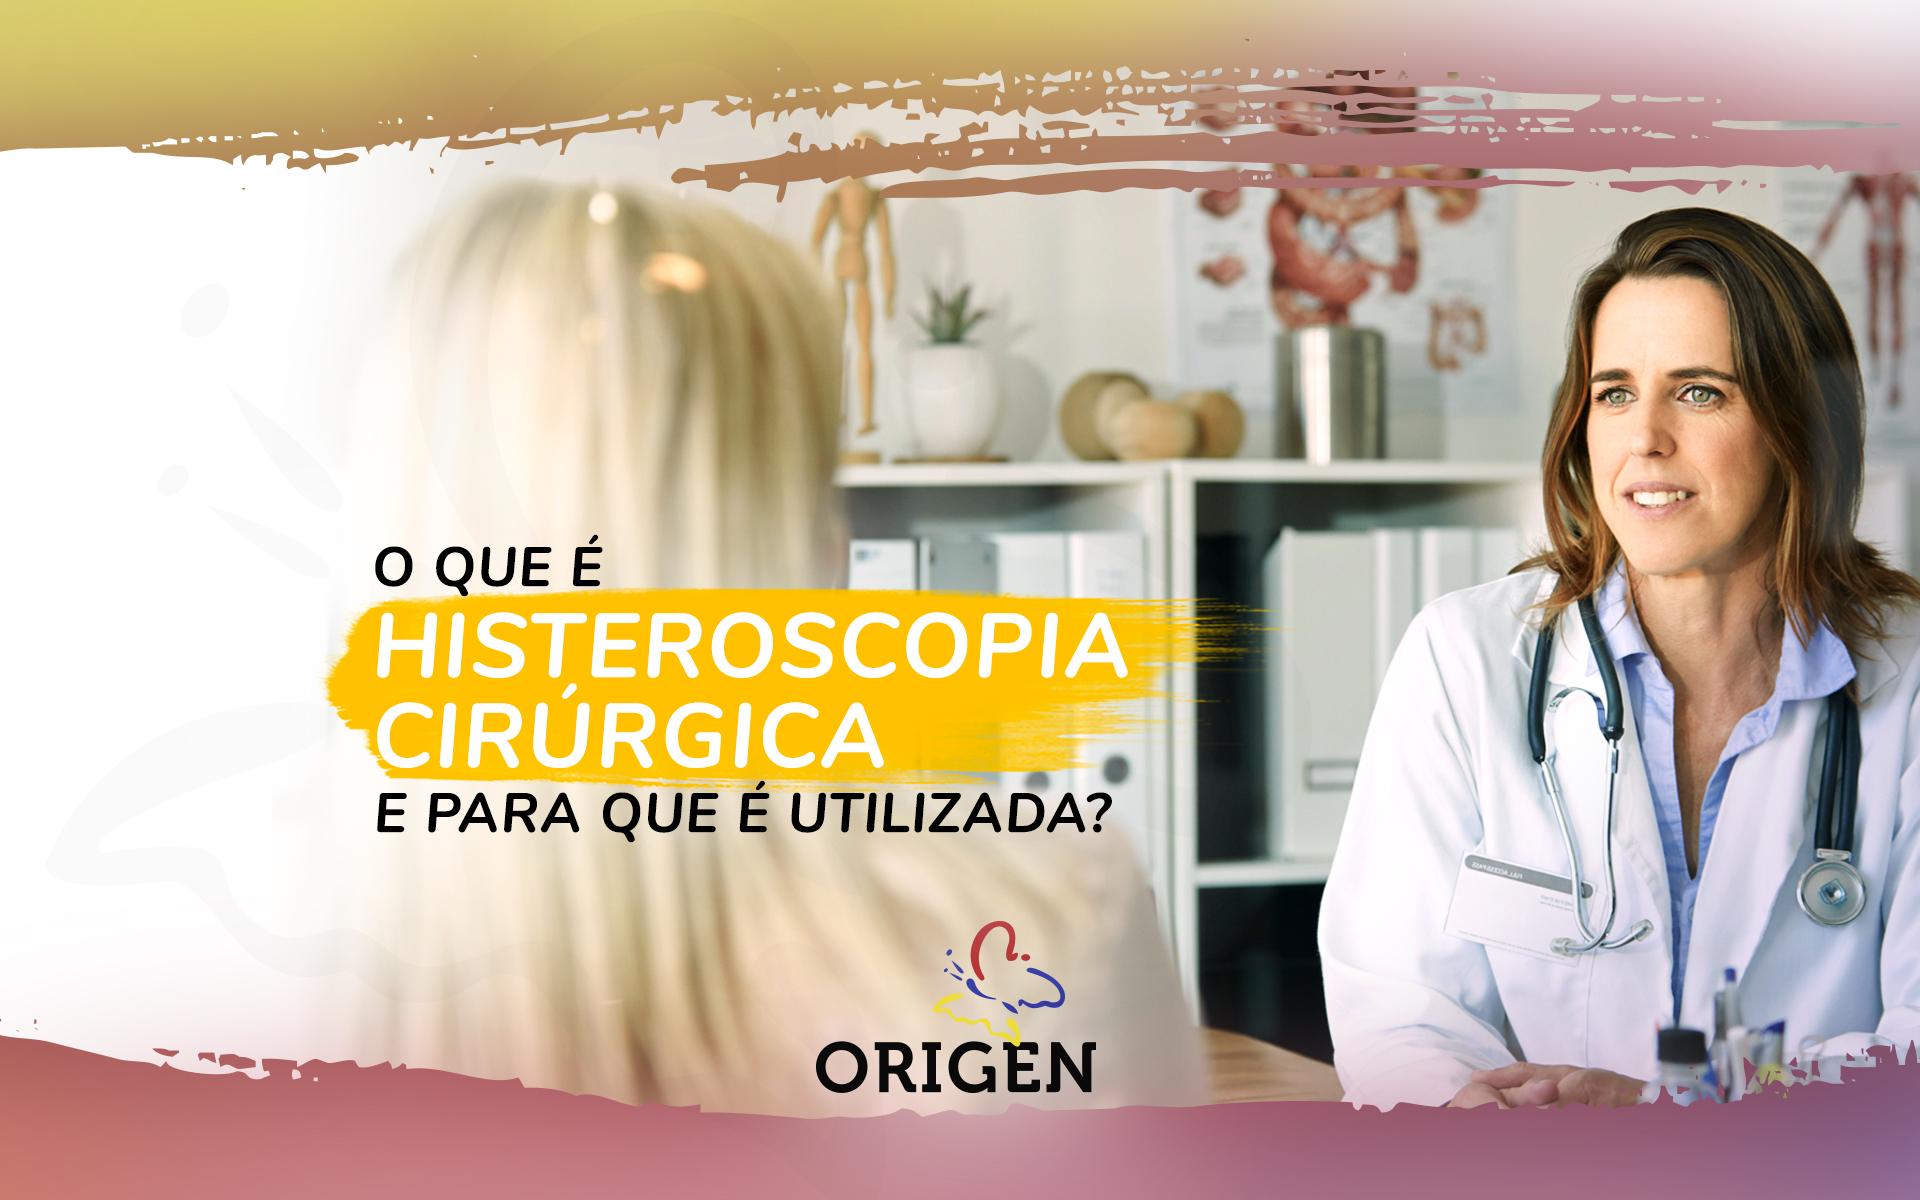 O que é histeroscopia cirúrgica e para que é utilizada?